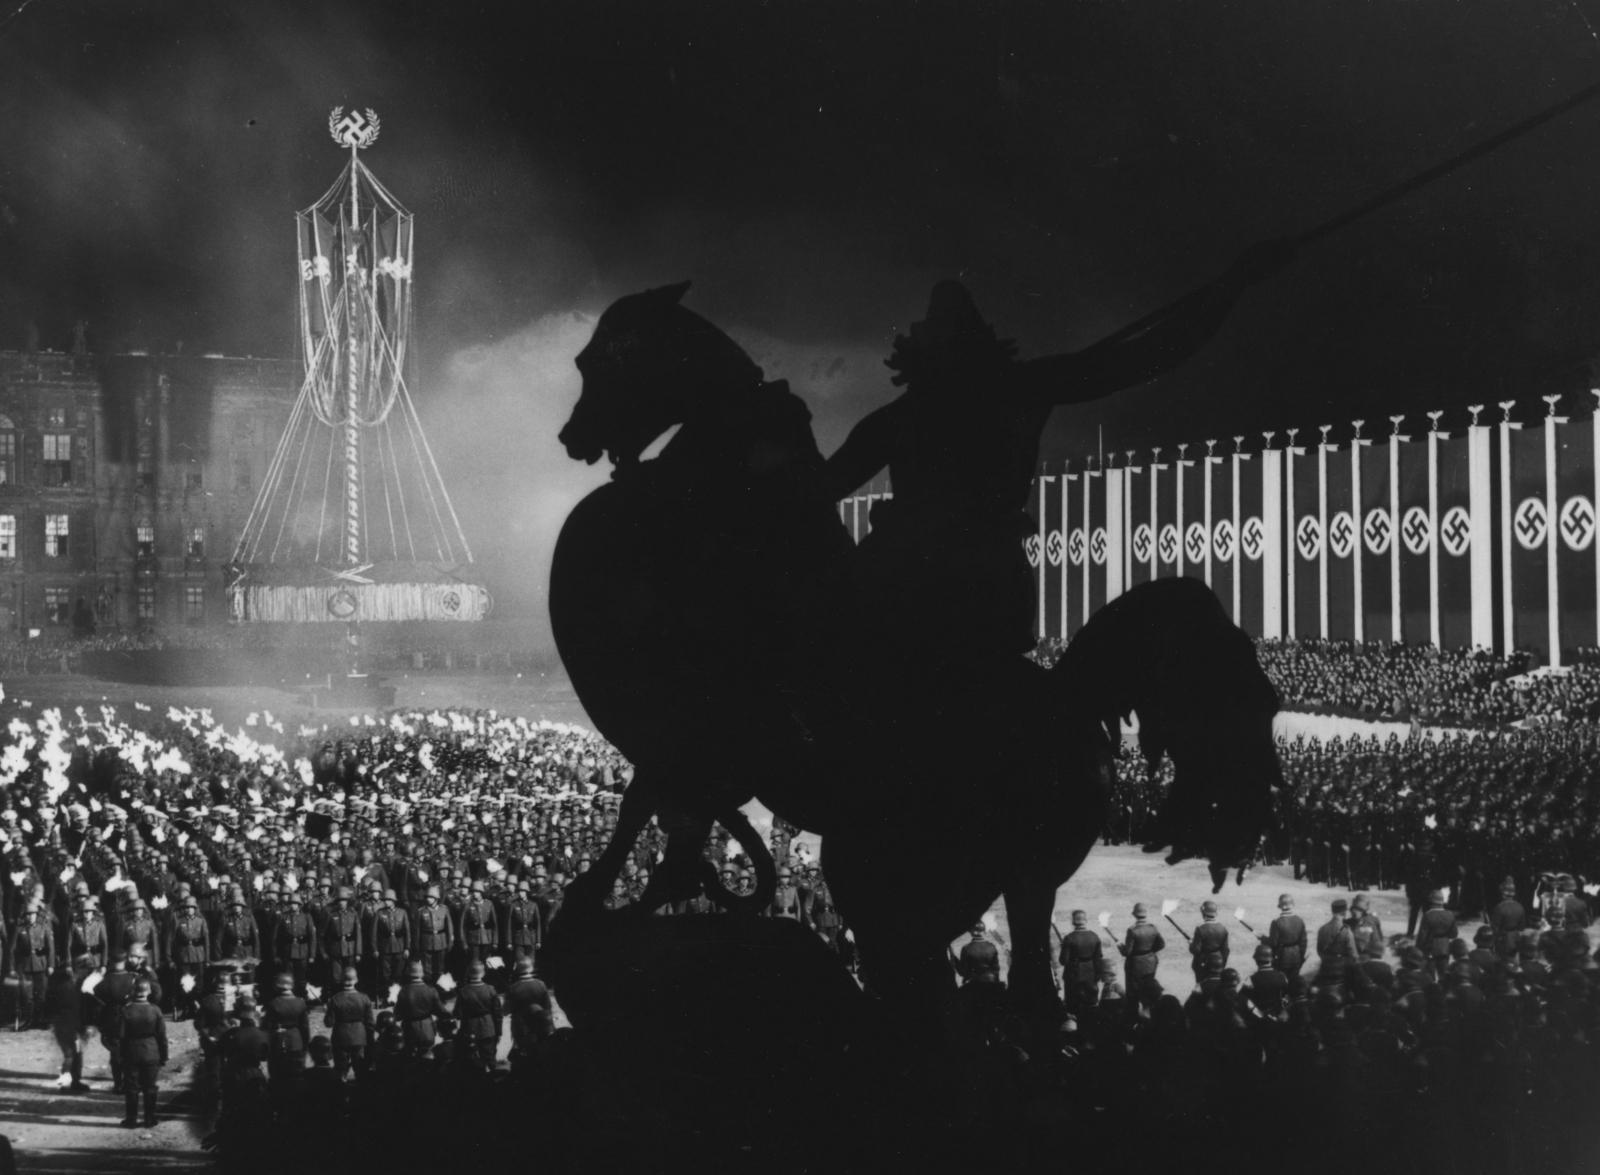 1936 Nazi rally in Berlin